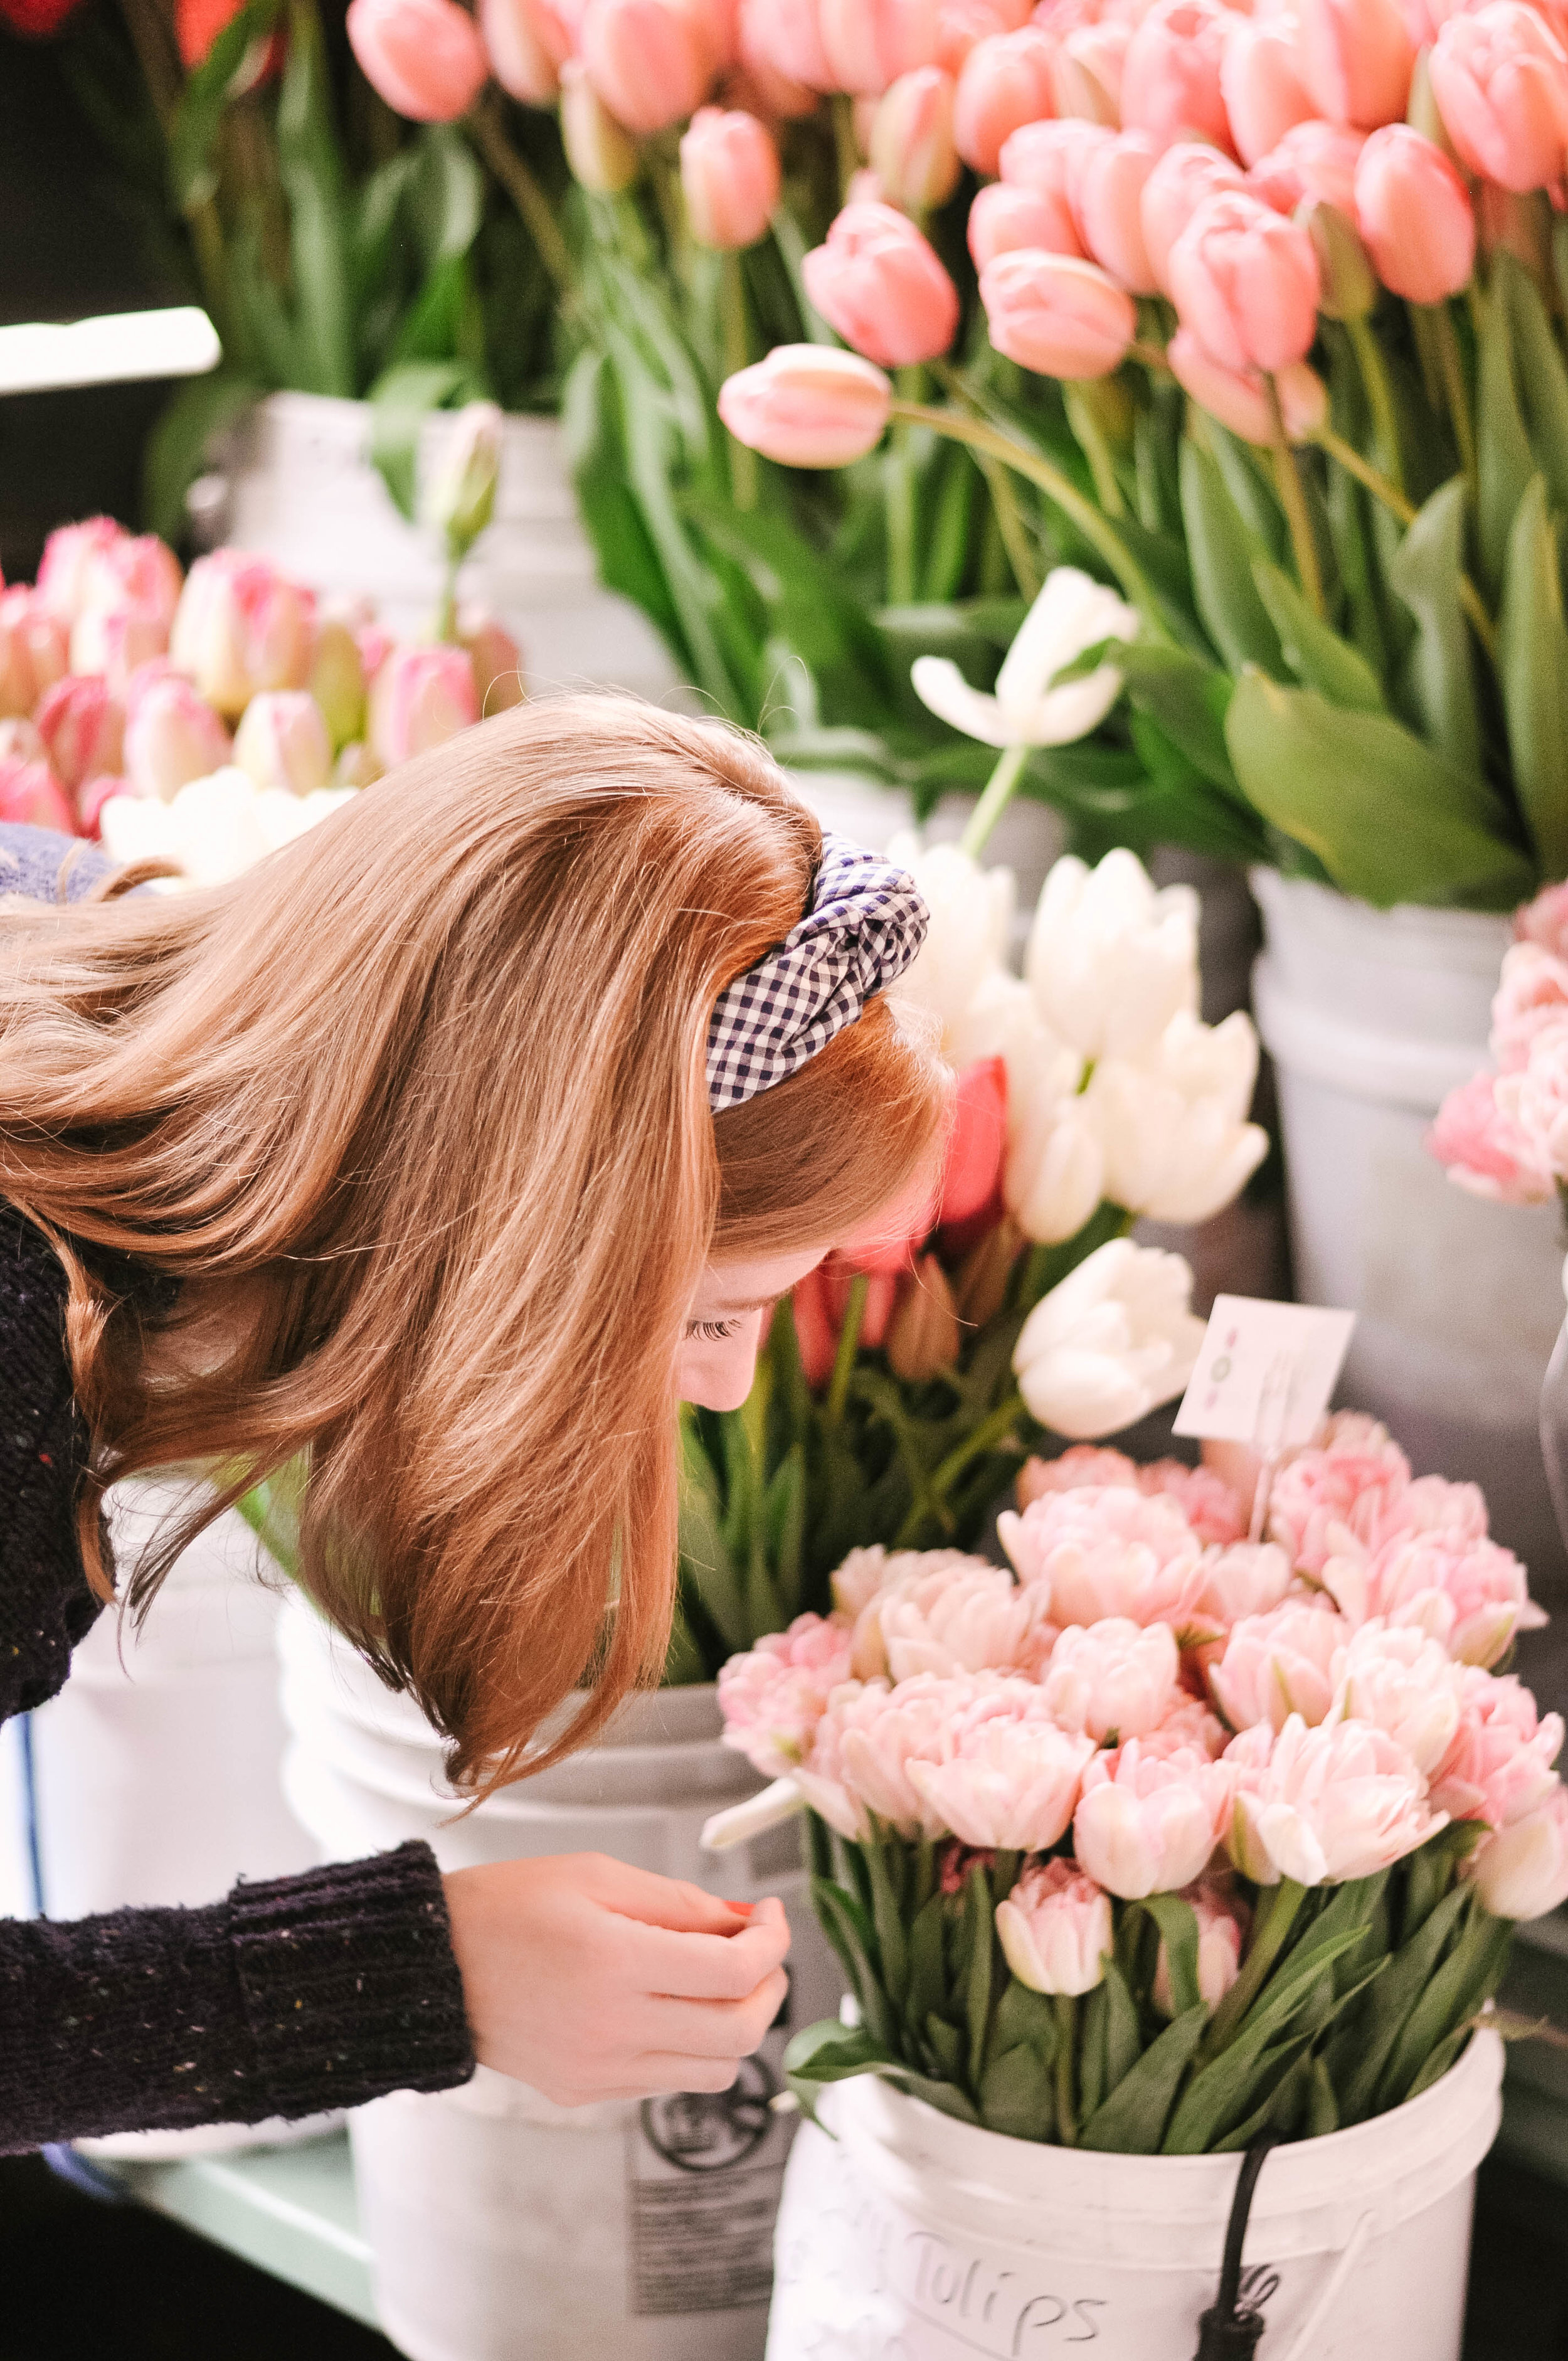 Woman at tulip flower market